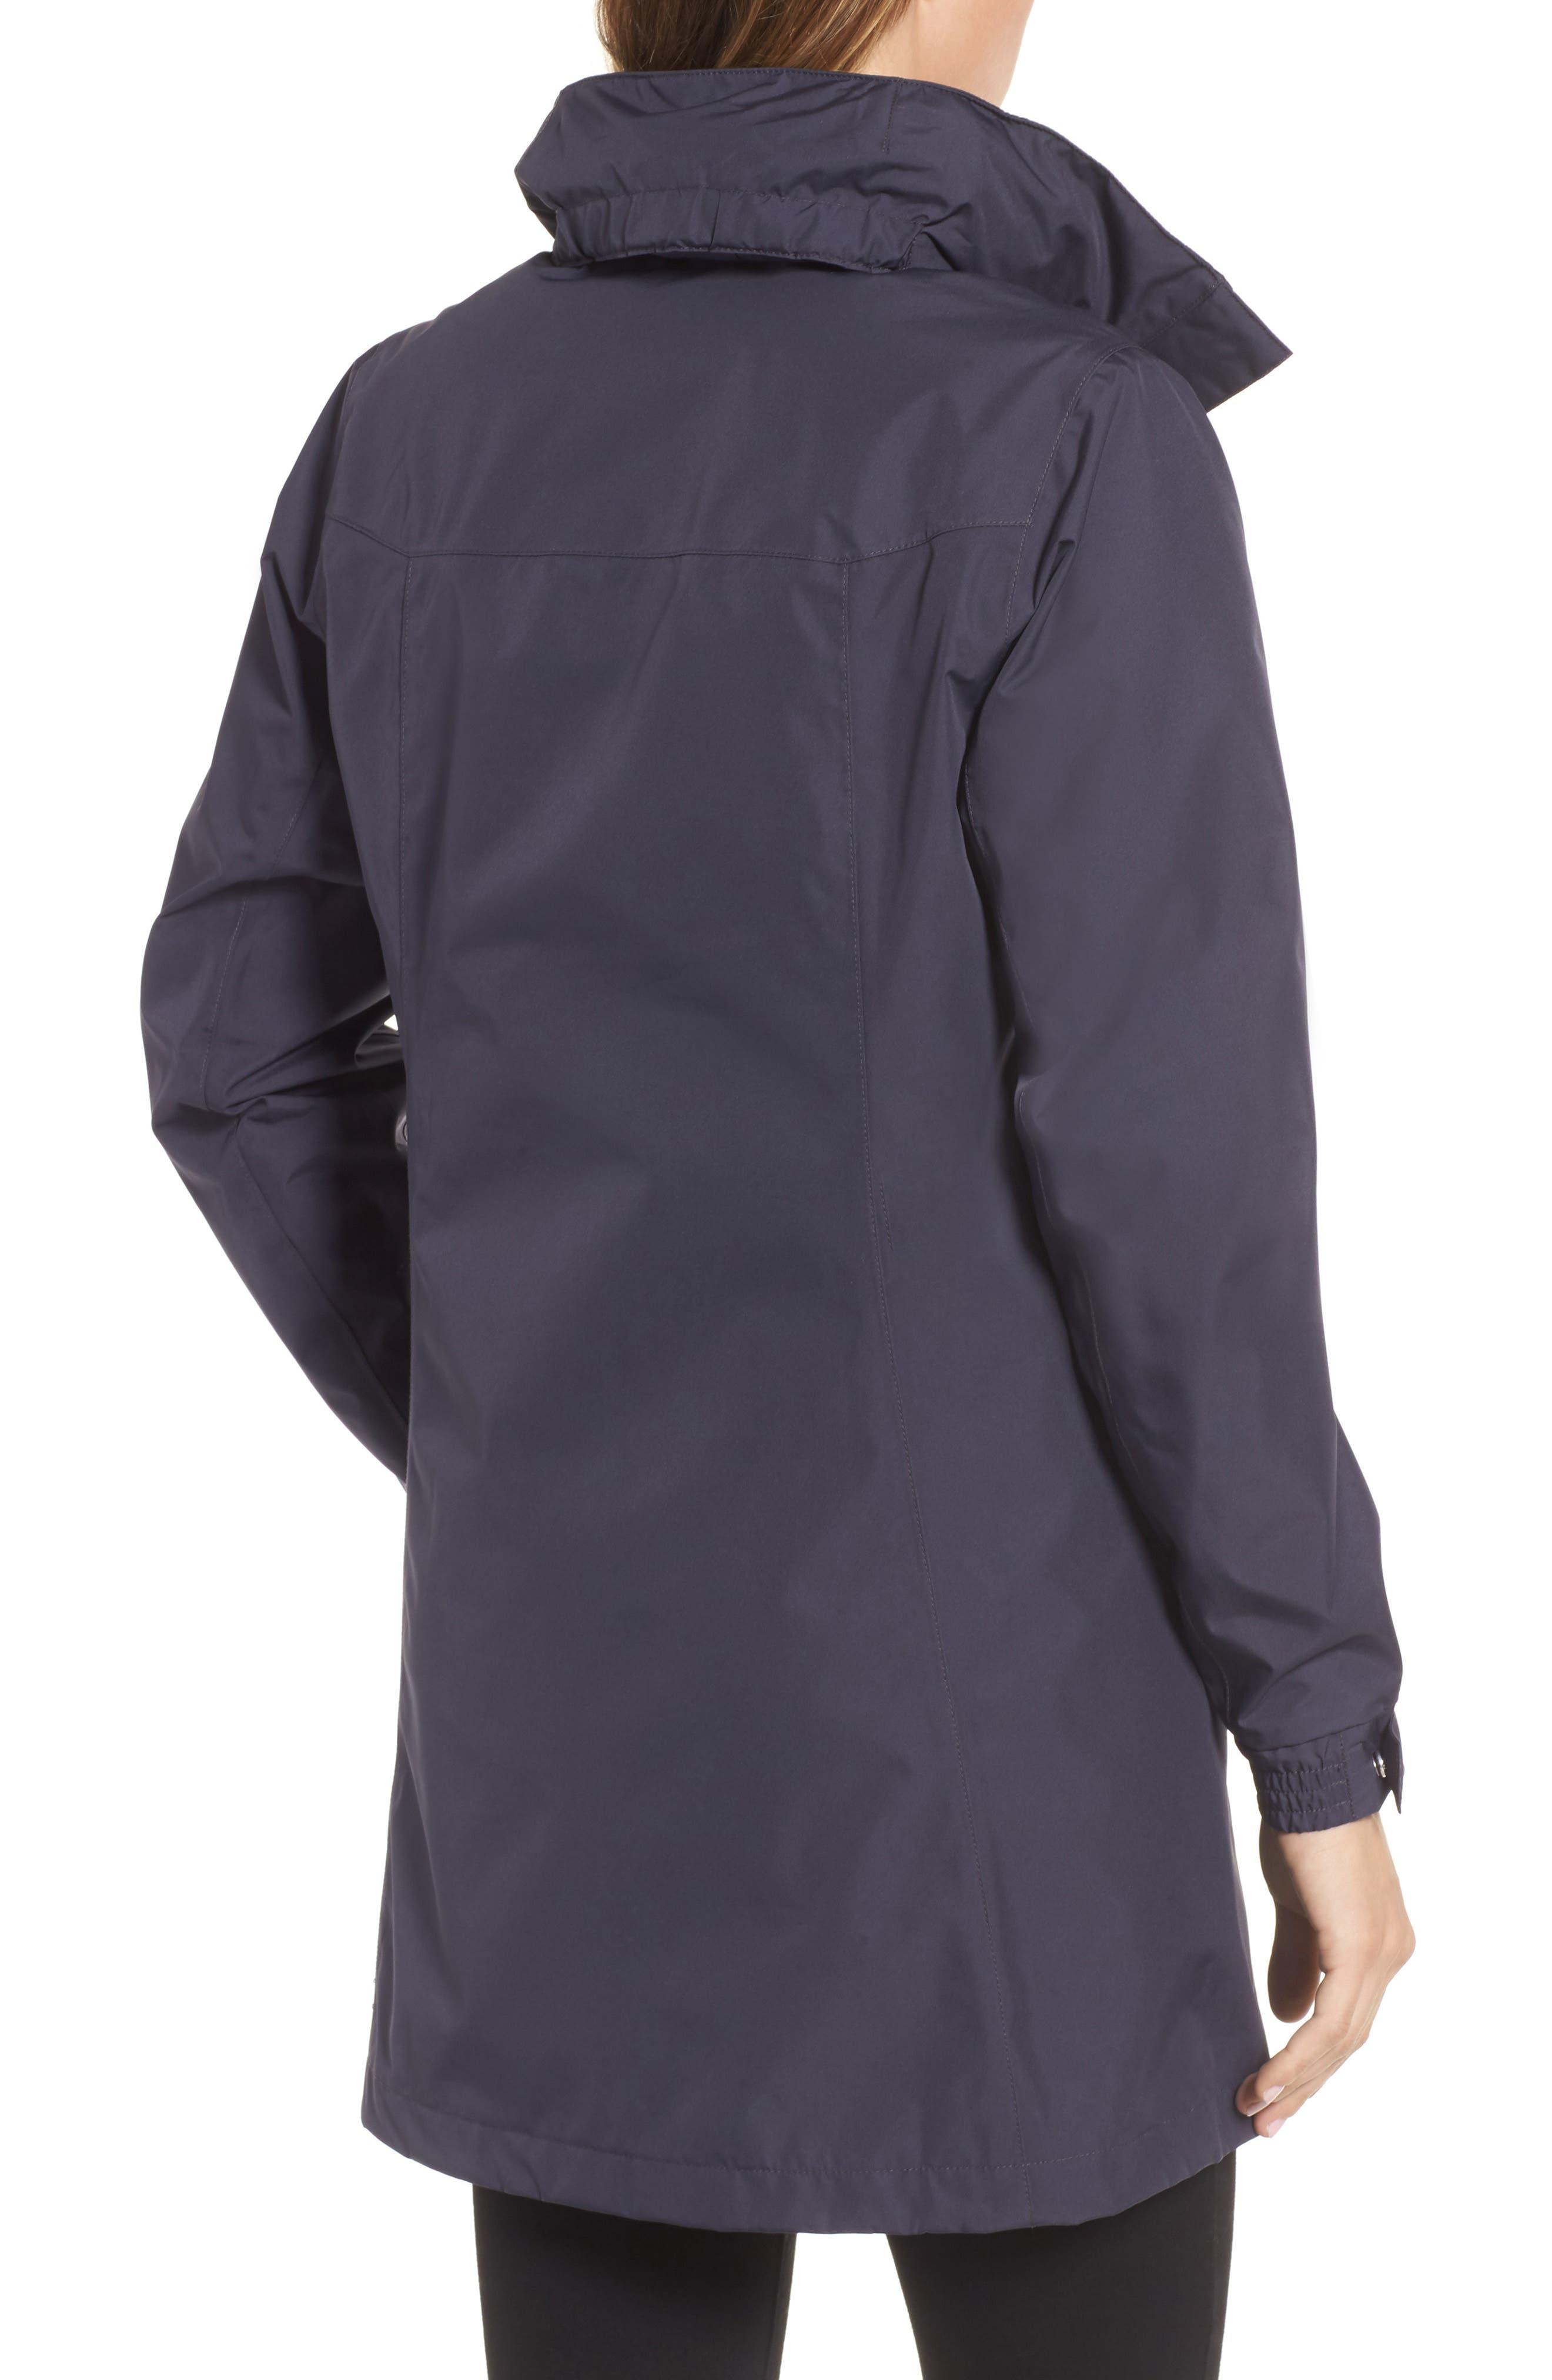 'Aden' Helly Tech<sup>®</sup> Raincoat,                             Alternate thumbnail 2, color,                             Graphite Blue